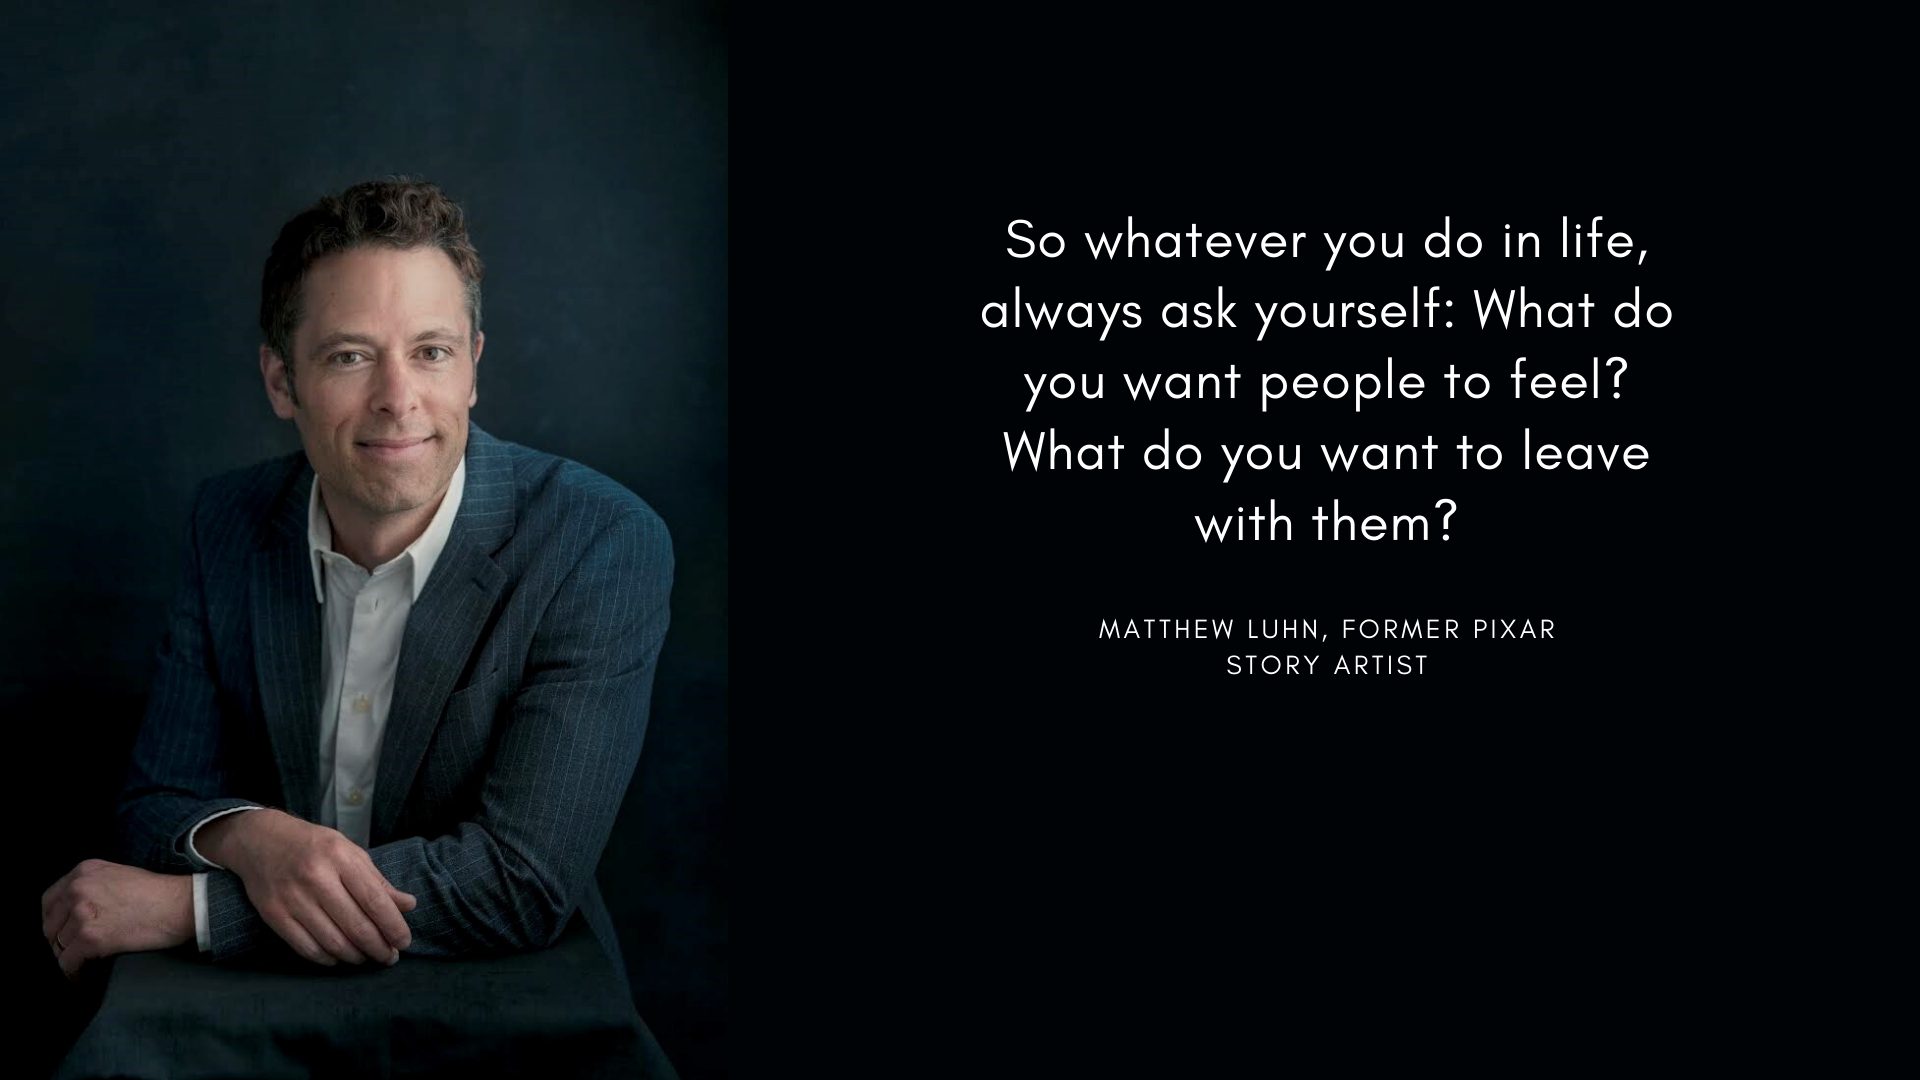 Matthew Luhn motivational quote